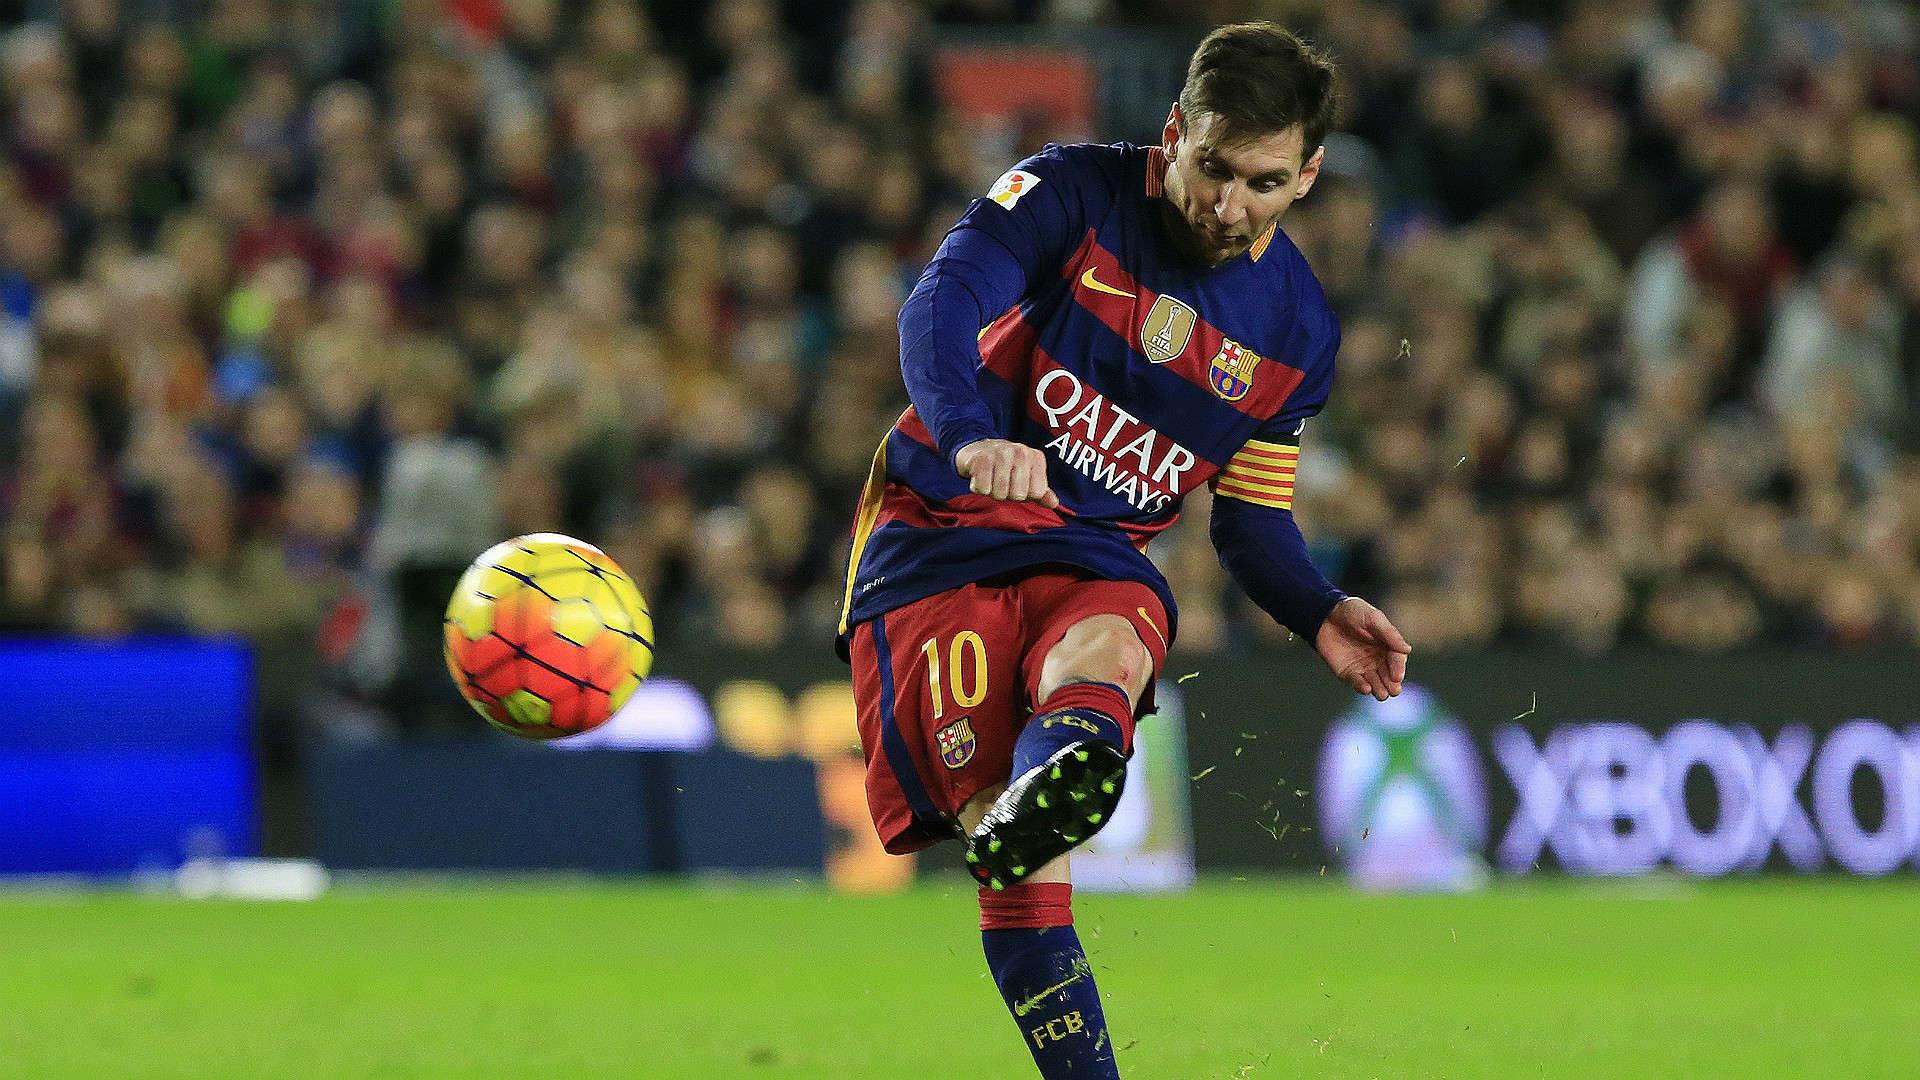 Messi HD Wallpapers 1080p 2016 - Wallpaper Cave